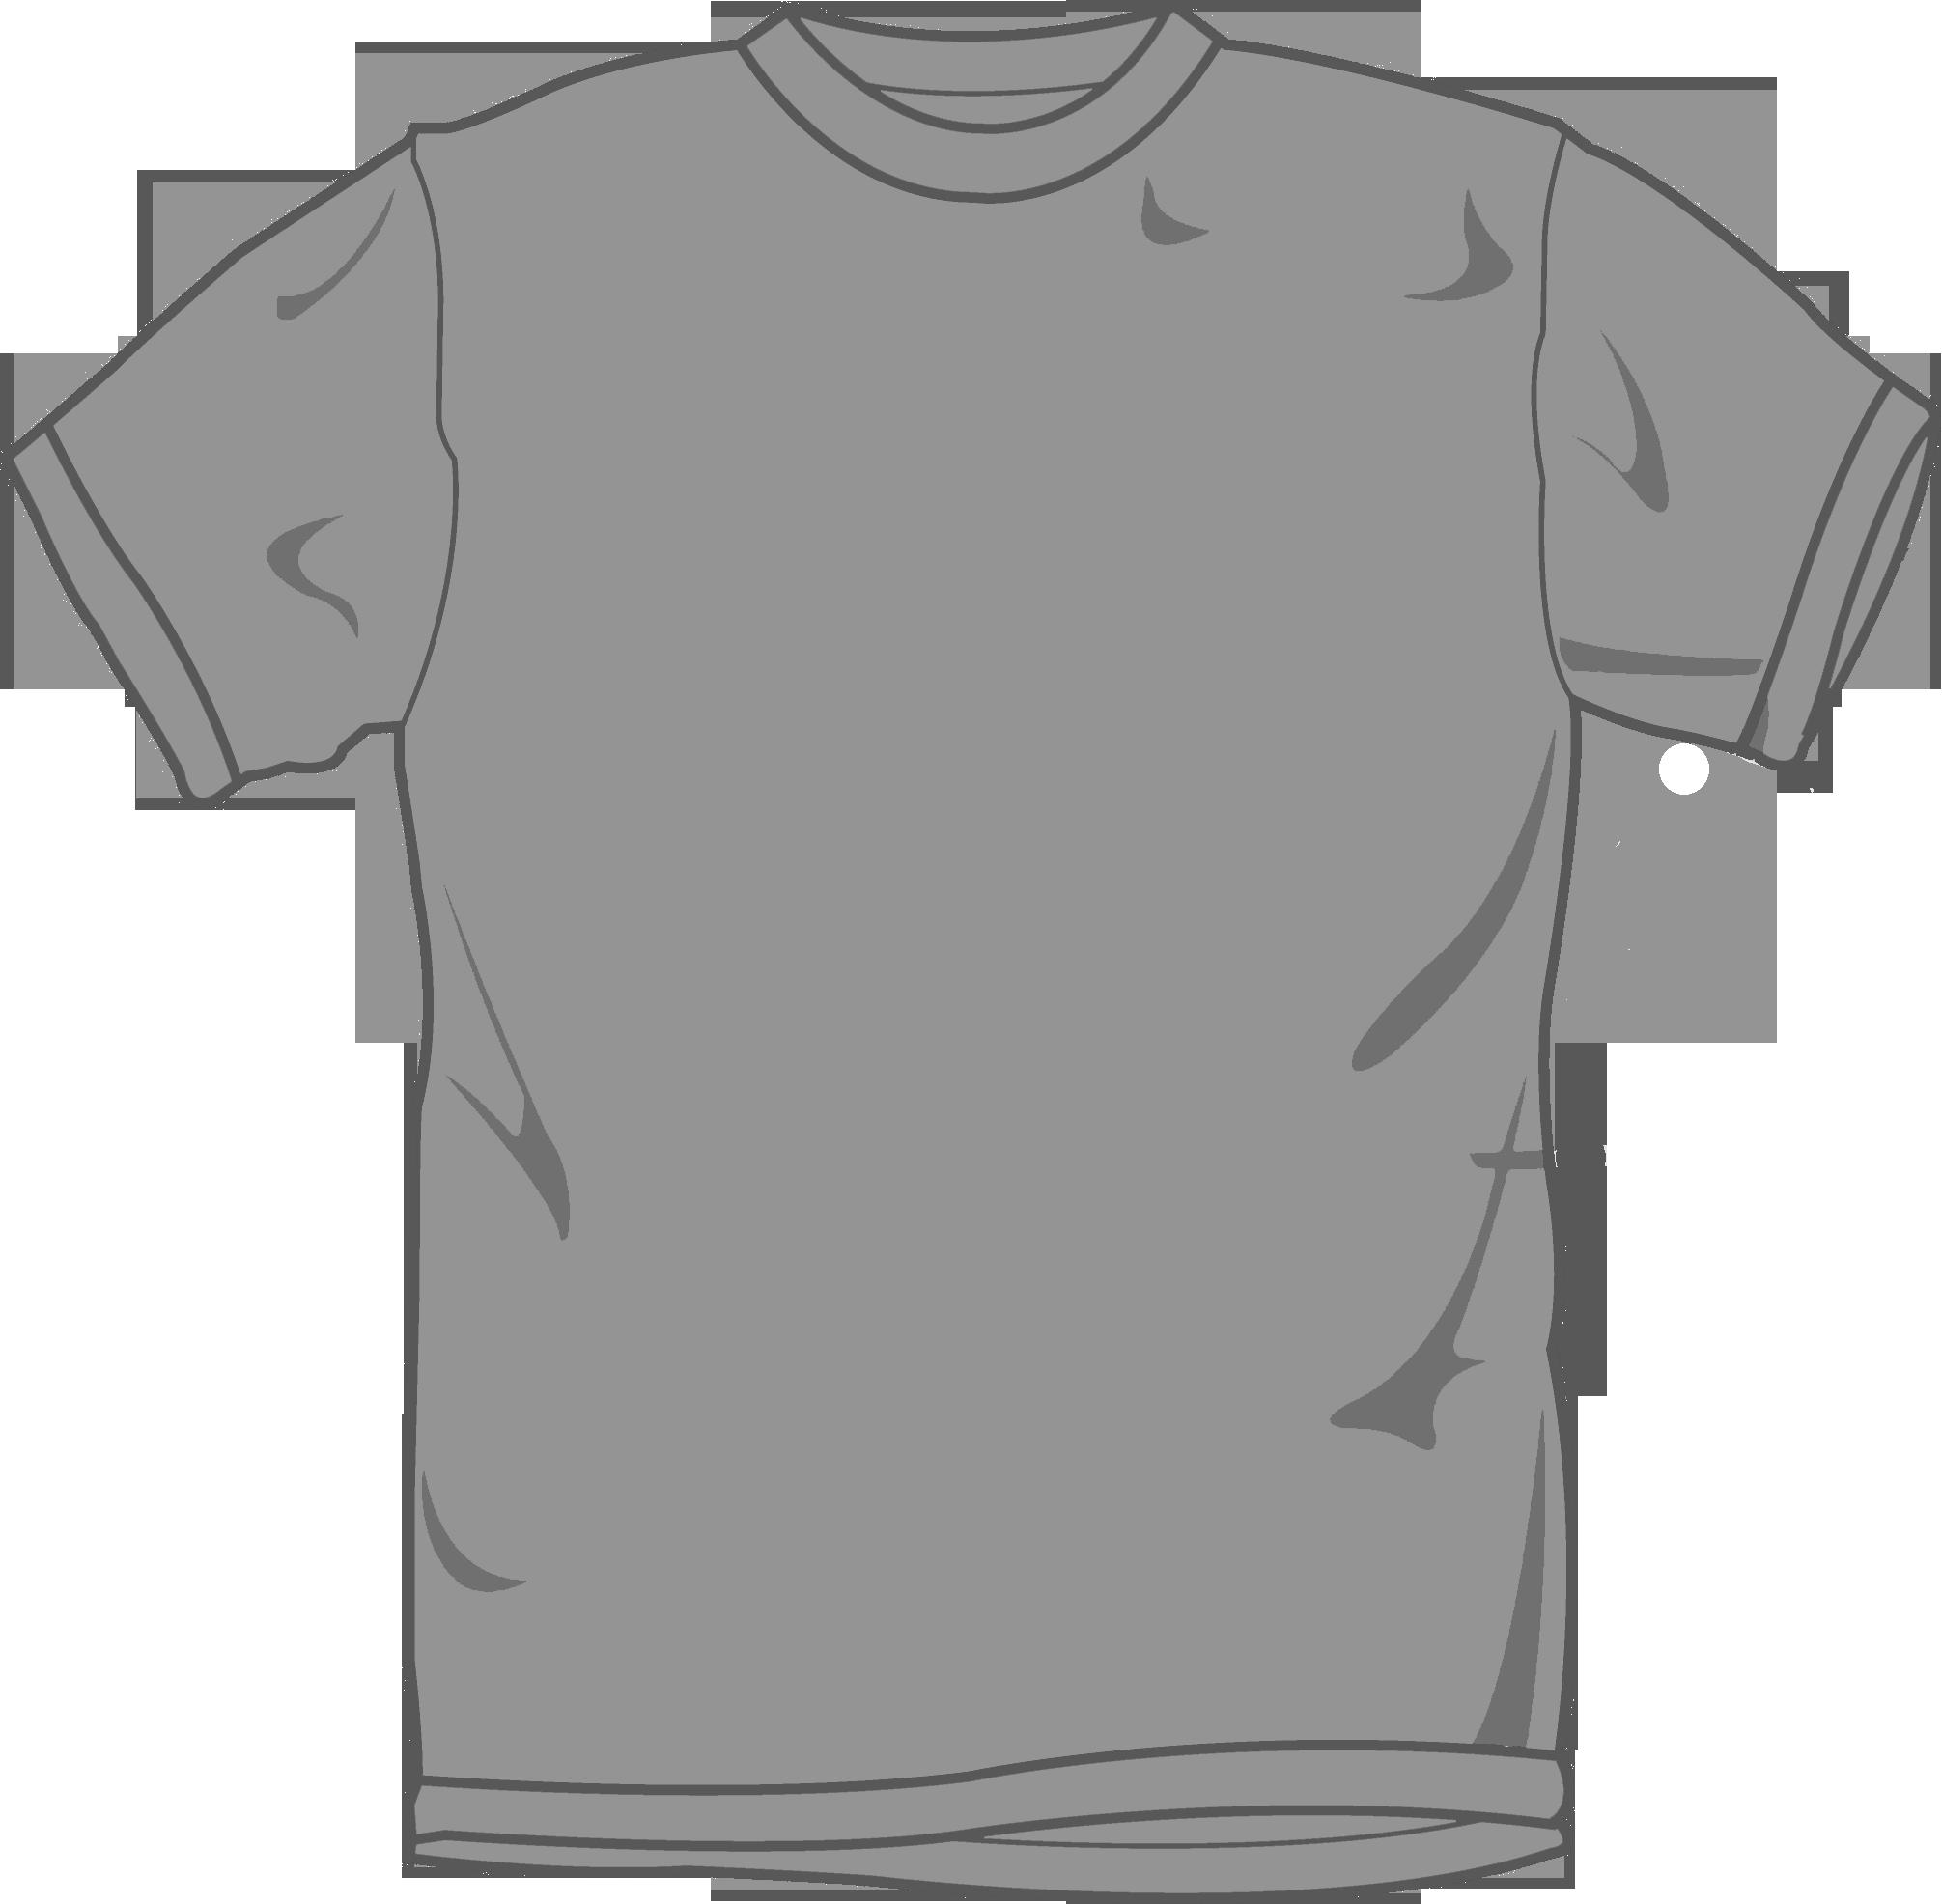 Free long sleeve t shirt template vectors.